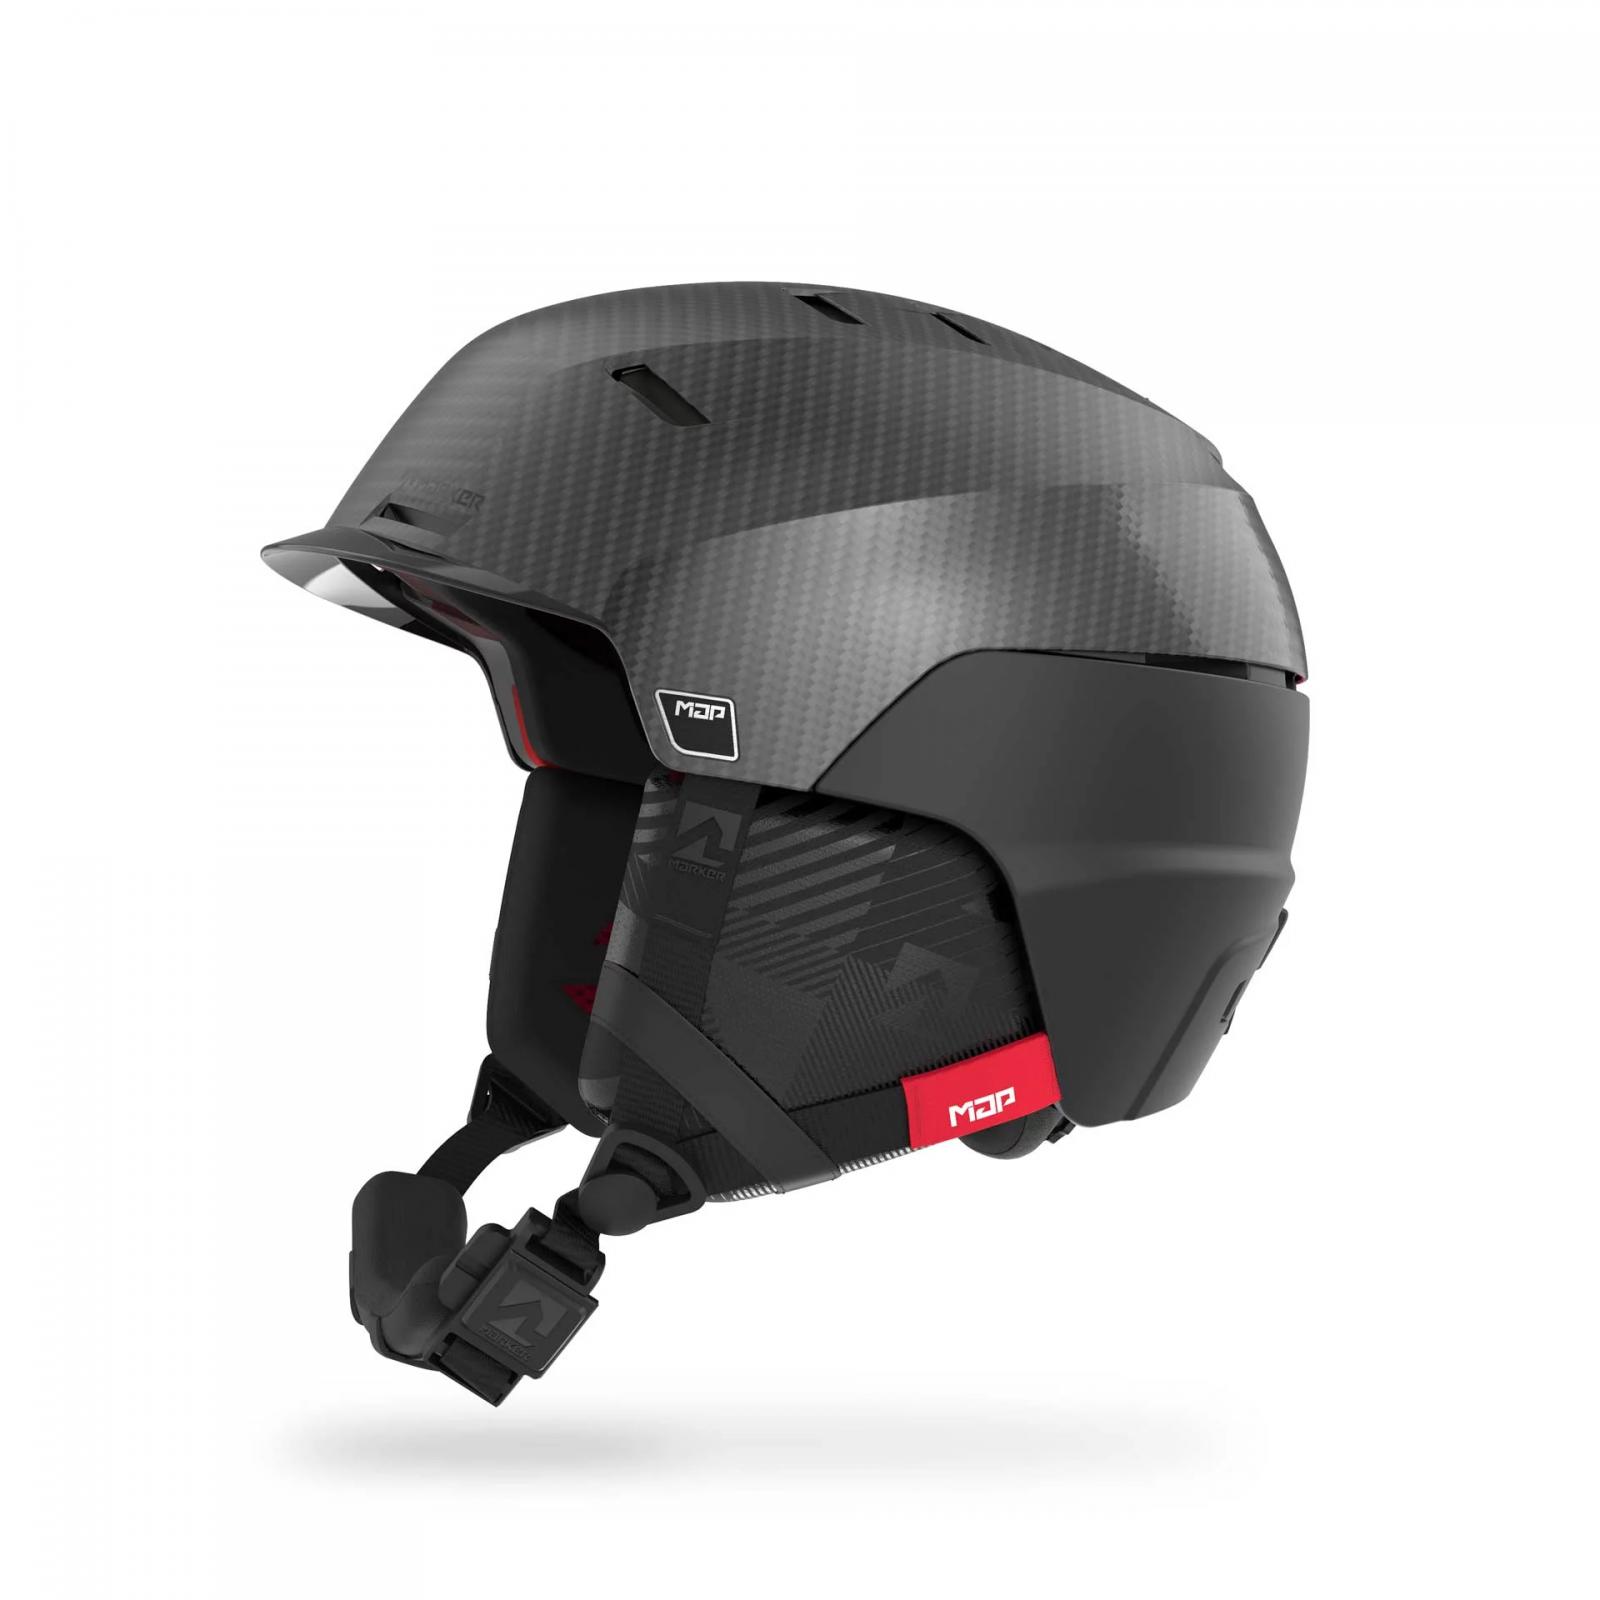 Marker Phoenix MAP Carbon Helmet 2021